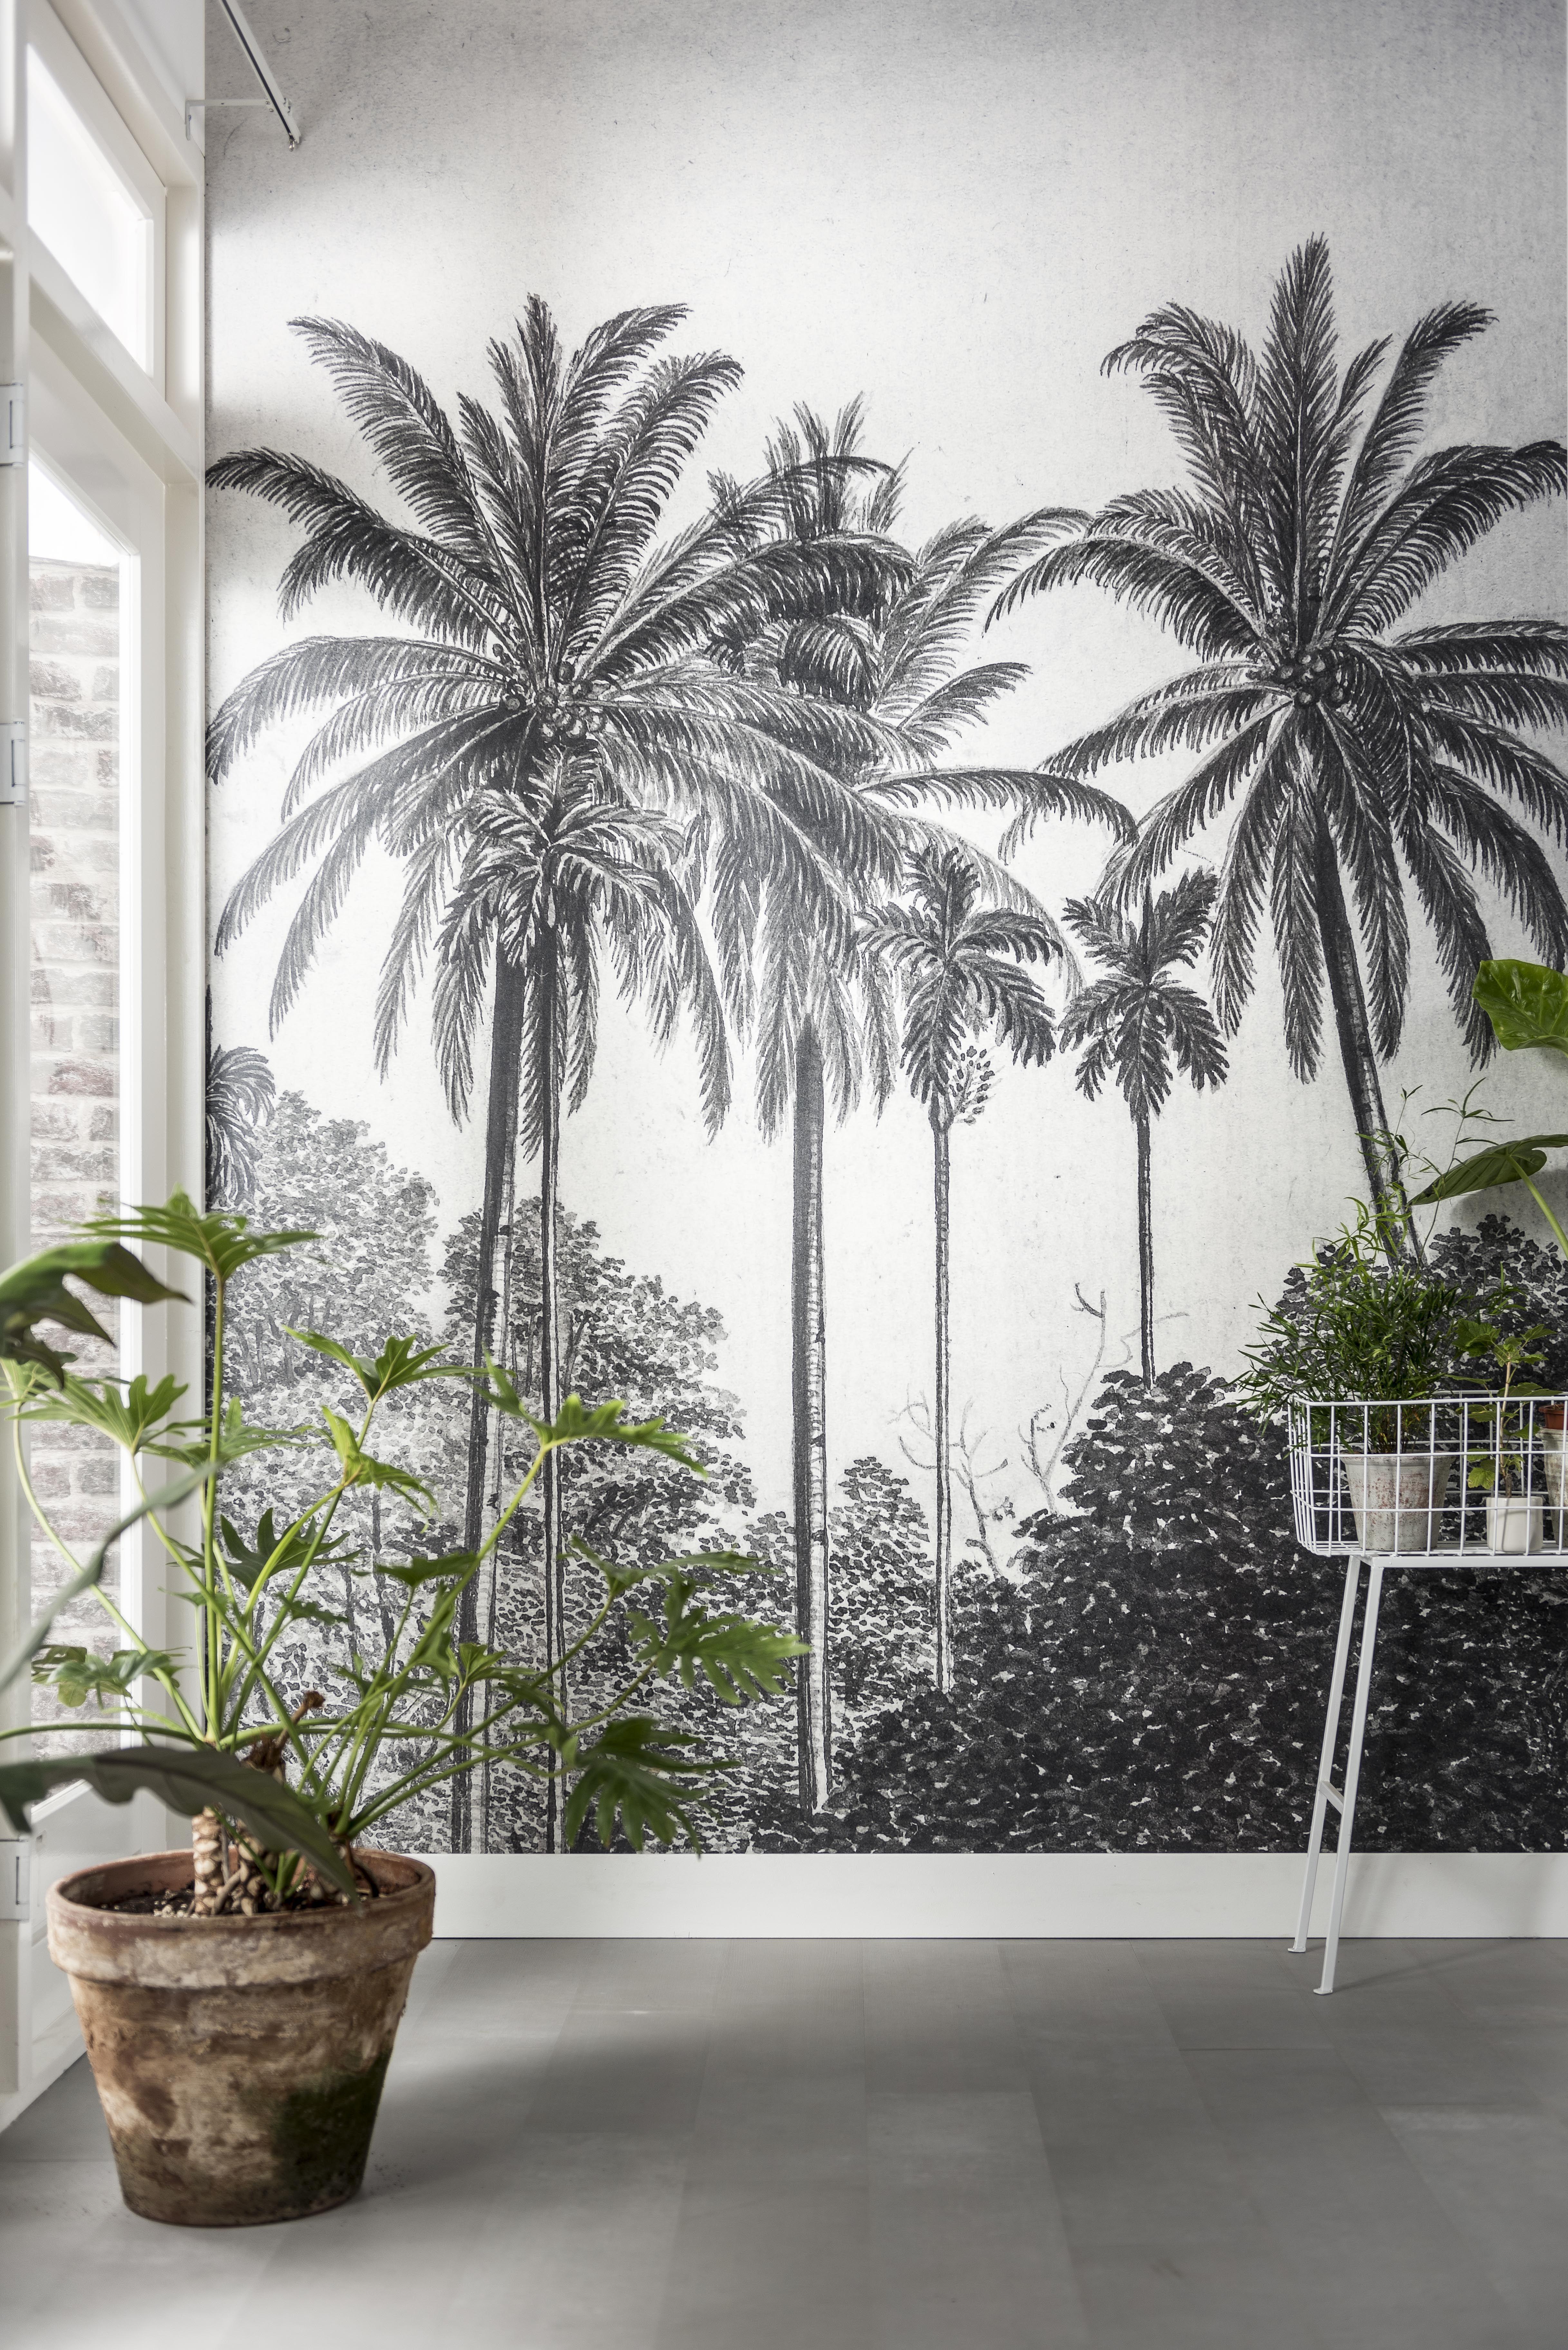 Green House in 2019  KARWEI  Behang ideen  Woonkamer